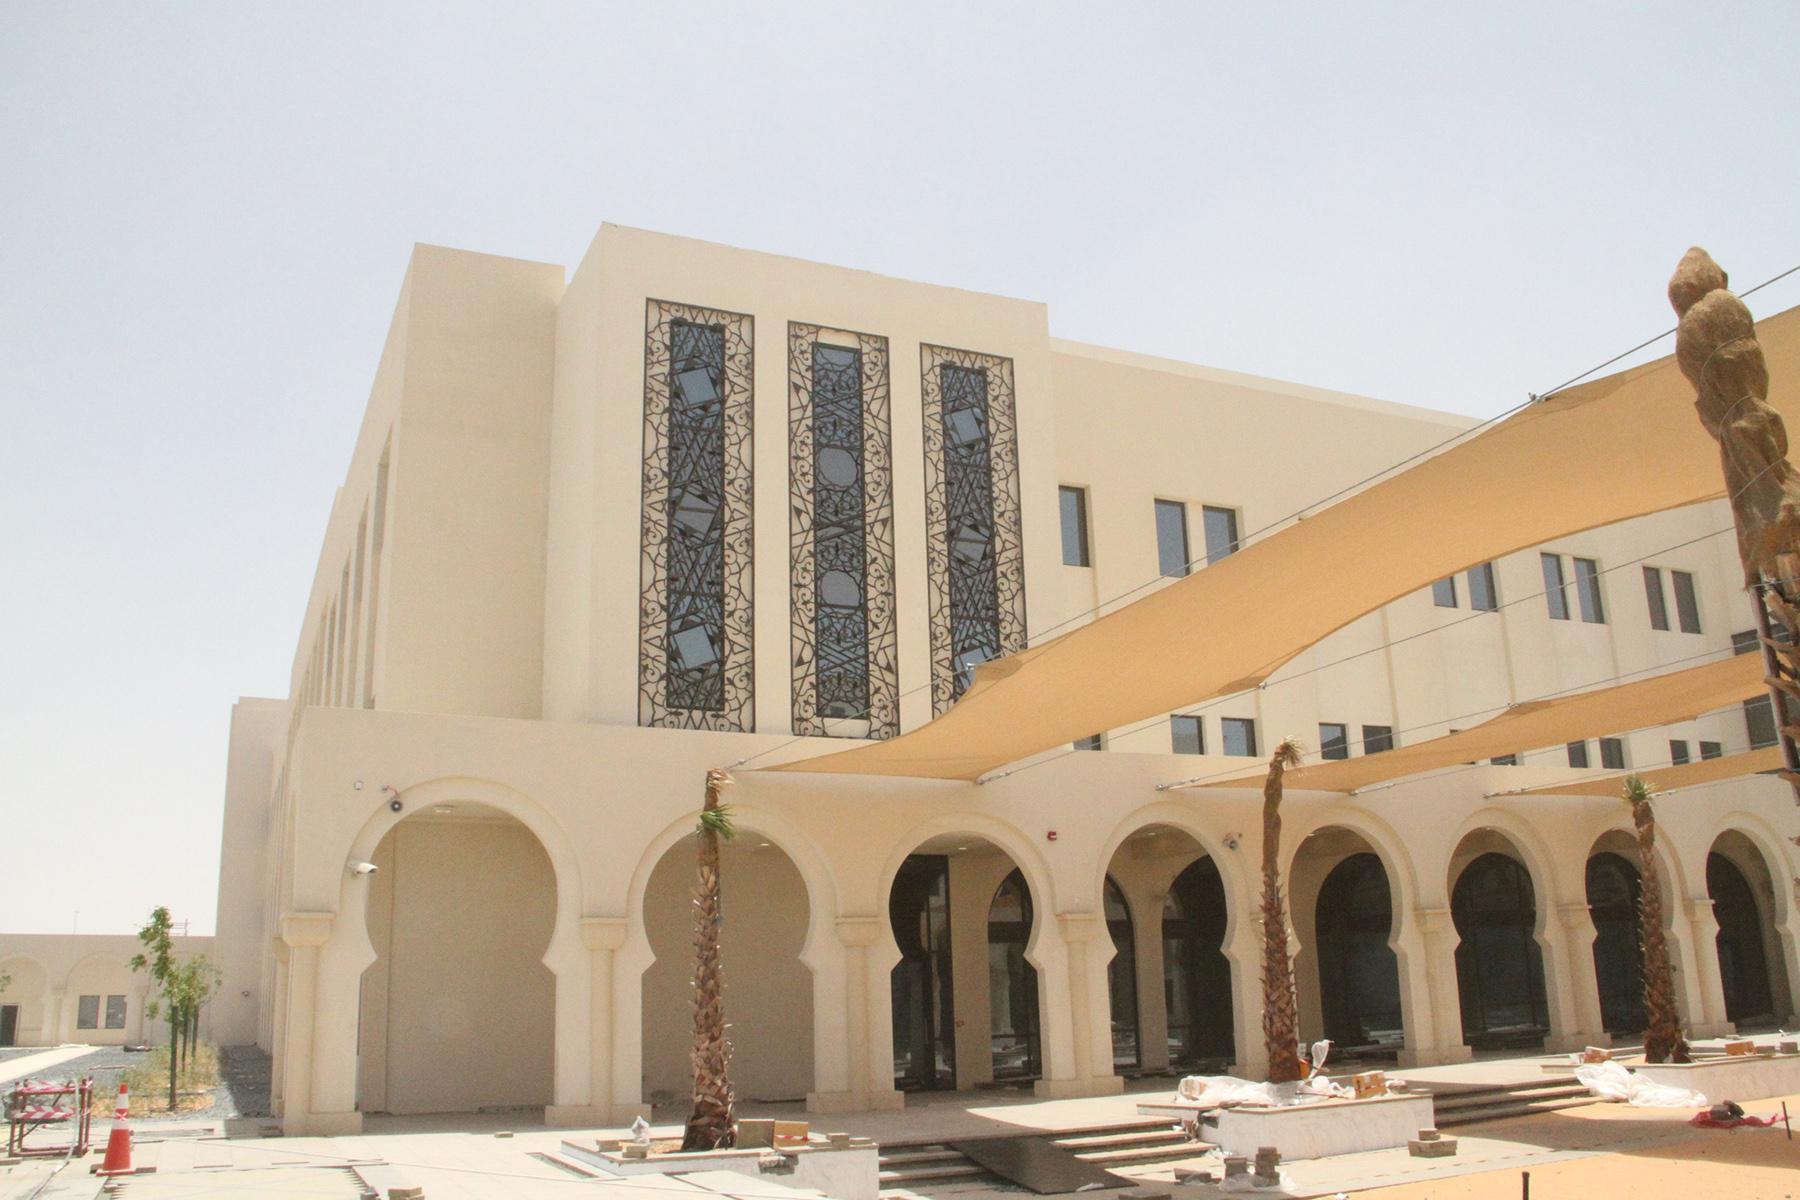 National Rehabilitation Center in Abu Dhabi